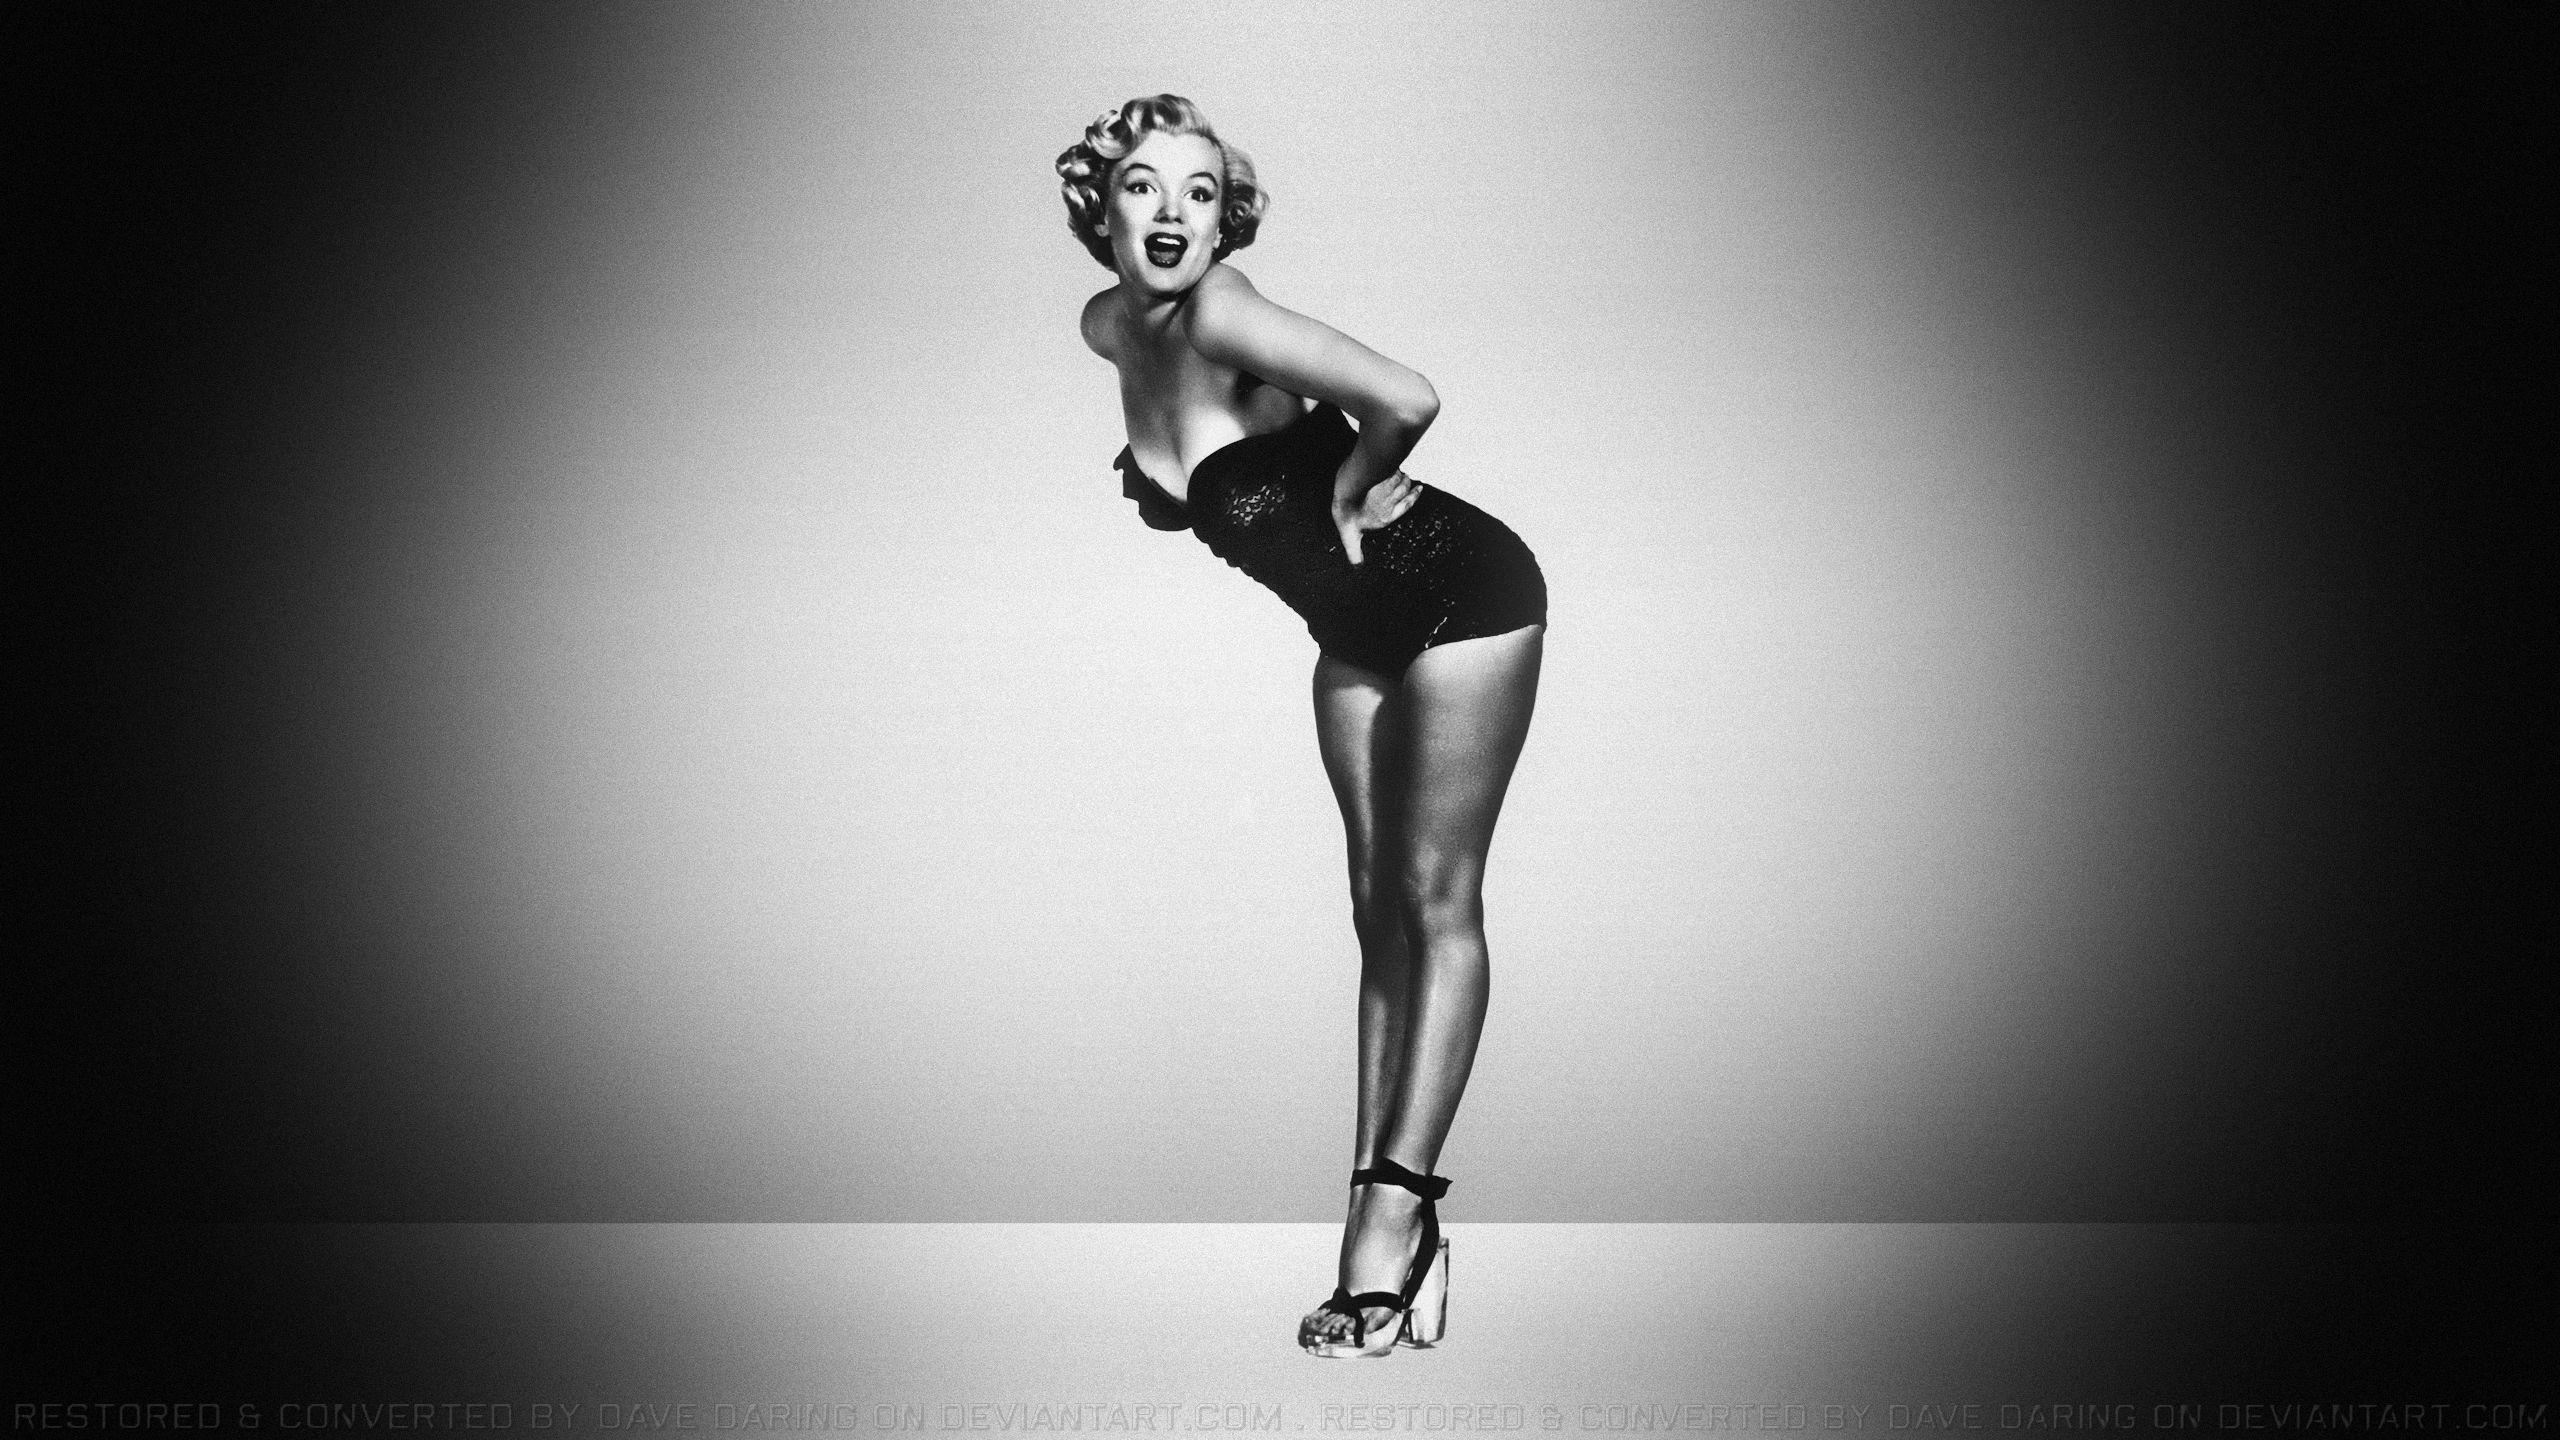 … Marilyn Monroe Peek A Boo by Dave-Daring